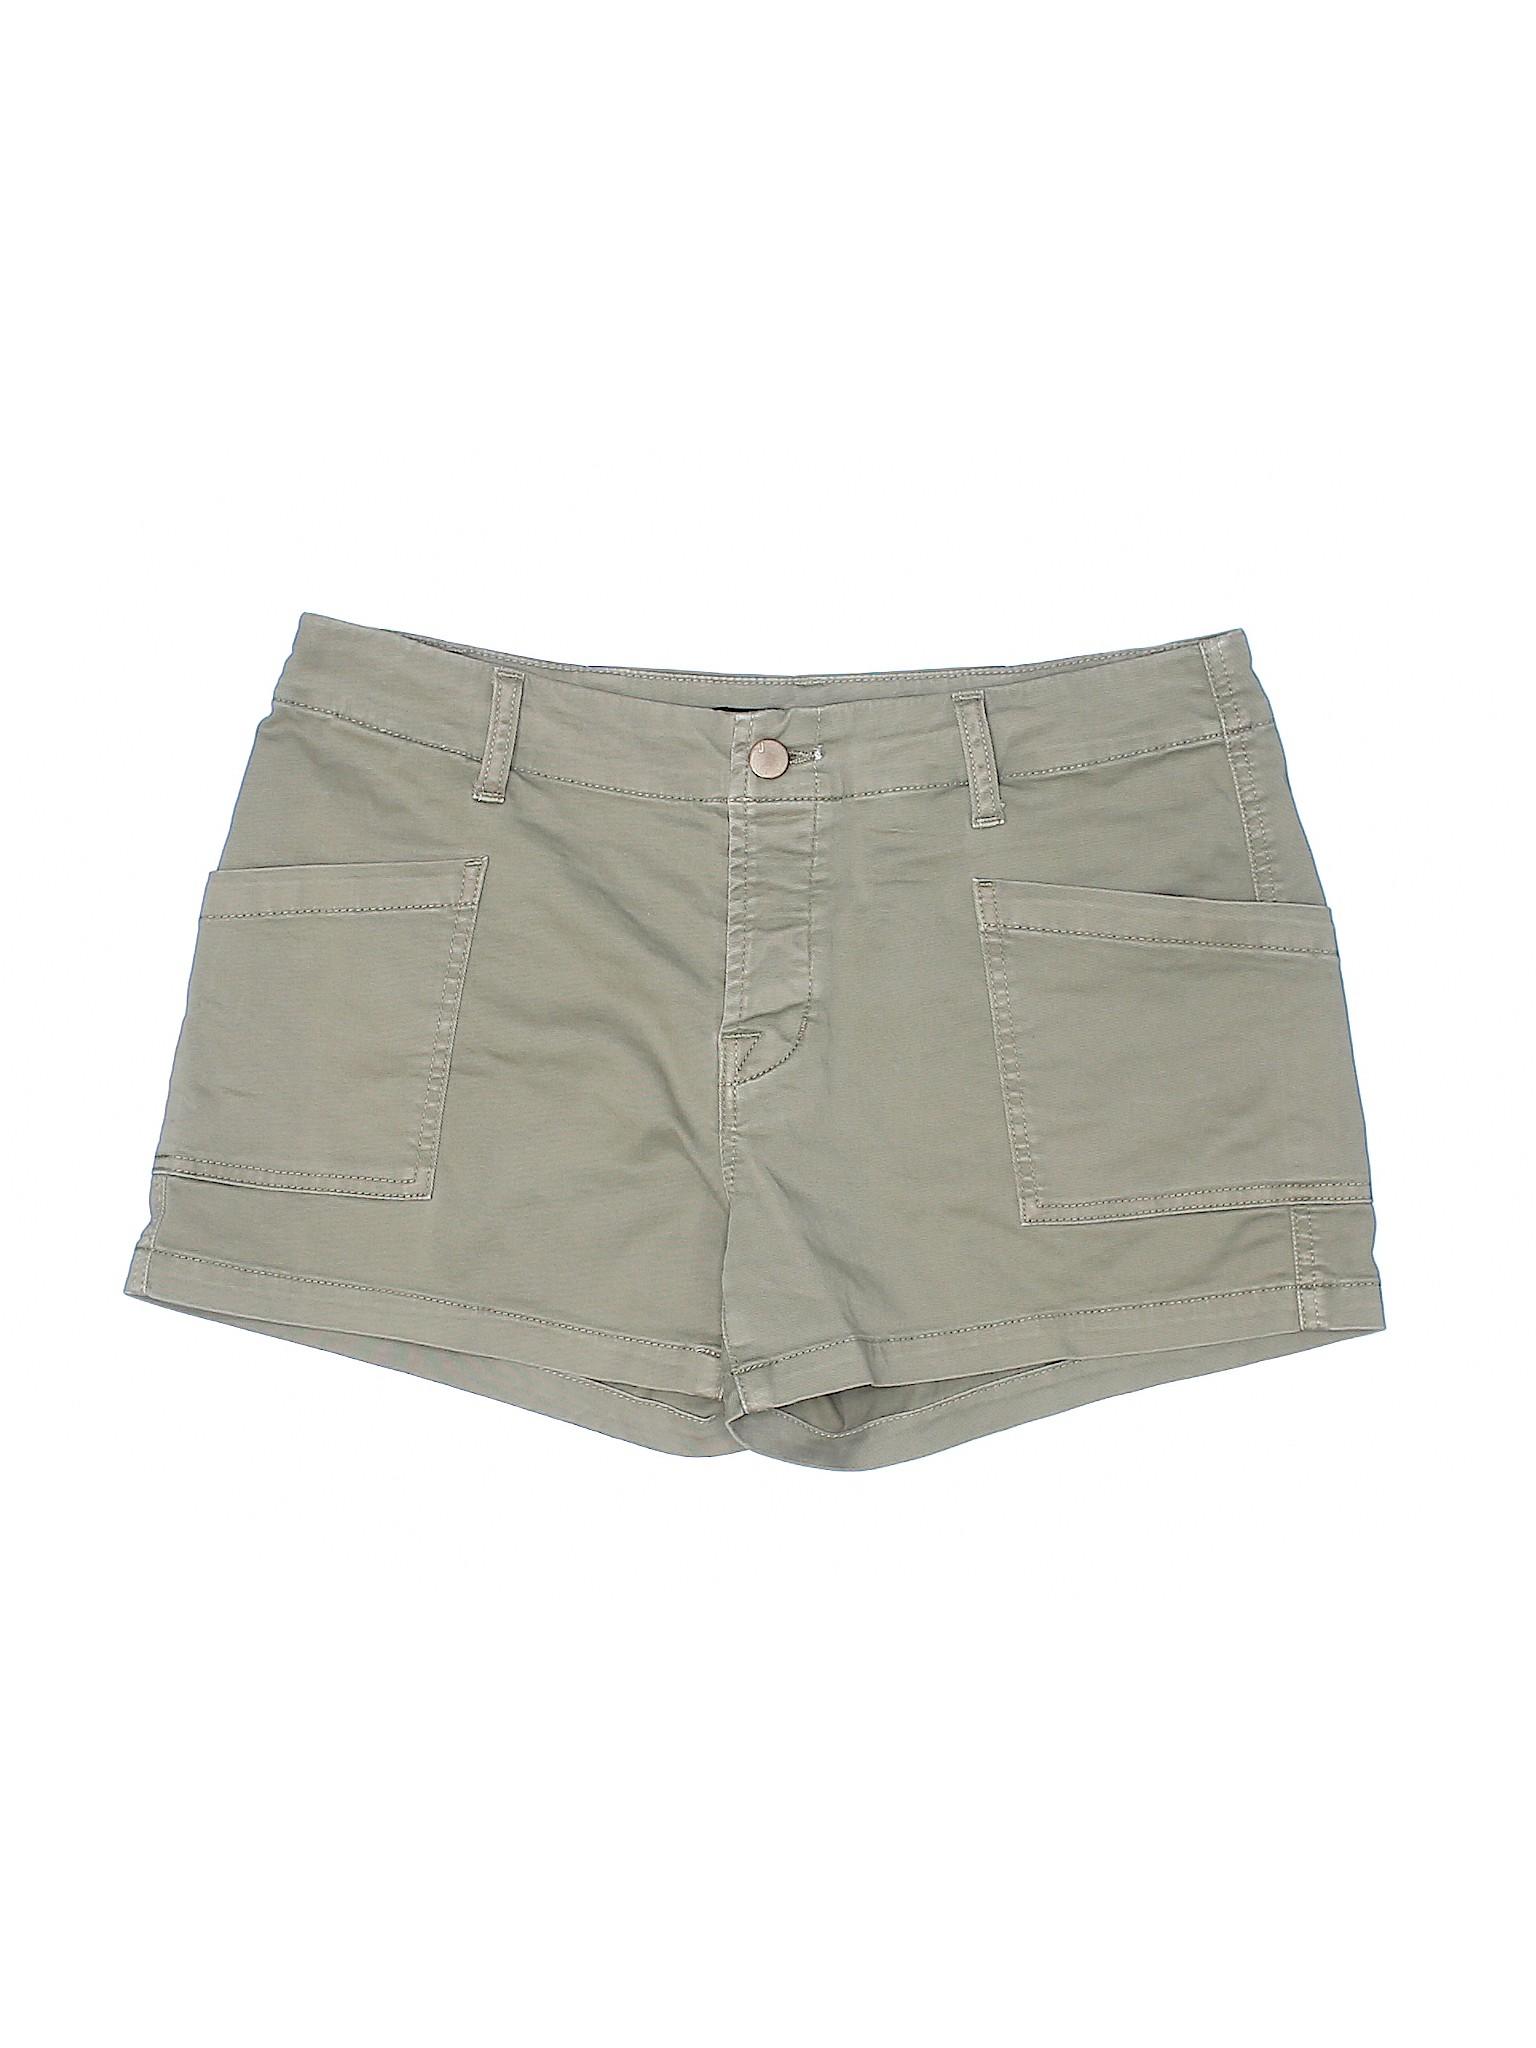 Boutique Boutique Shorts Brand J J Boutique Khaki Brand Khaki J Brand Shorts awaqgrp